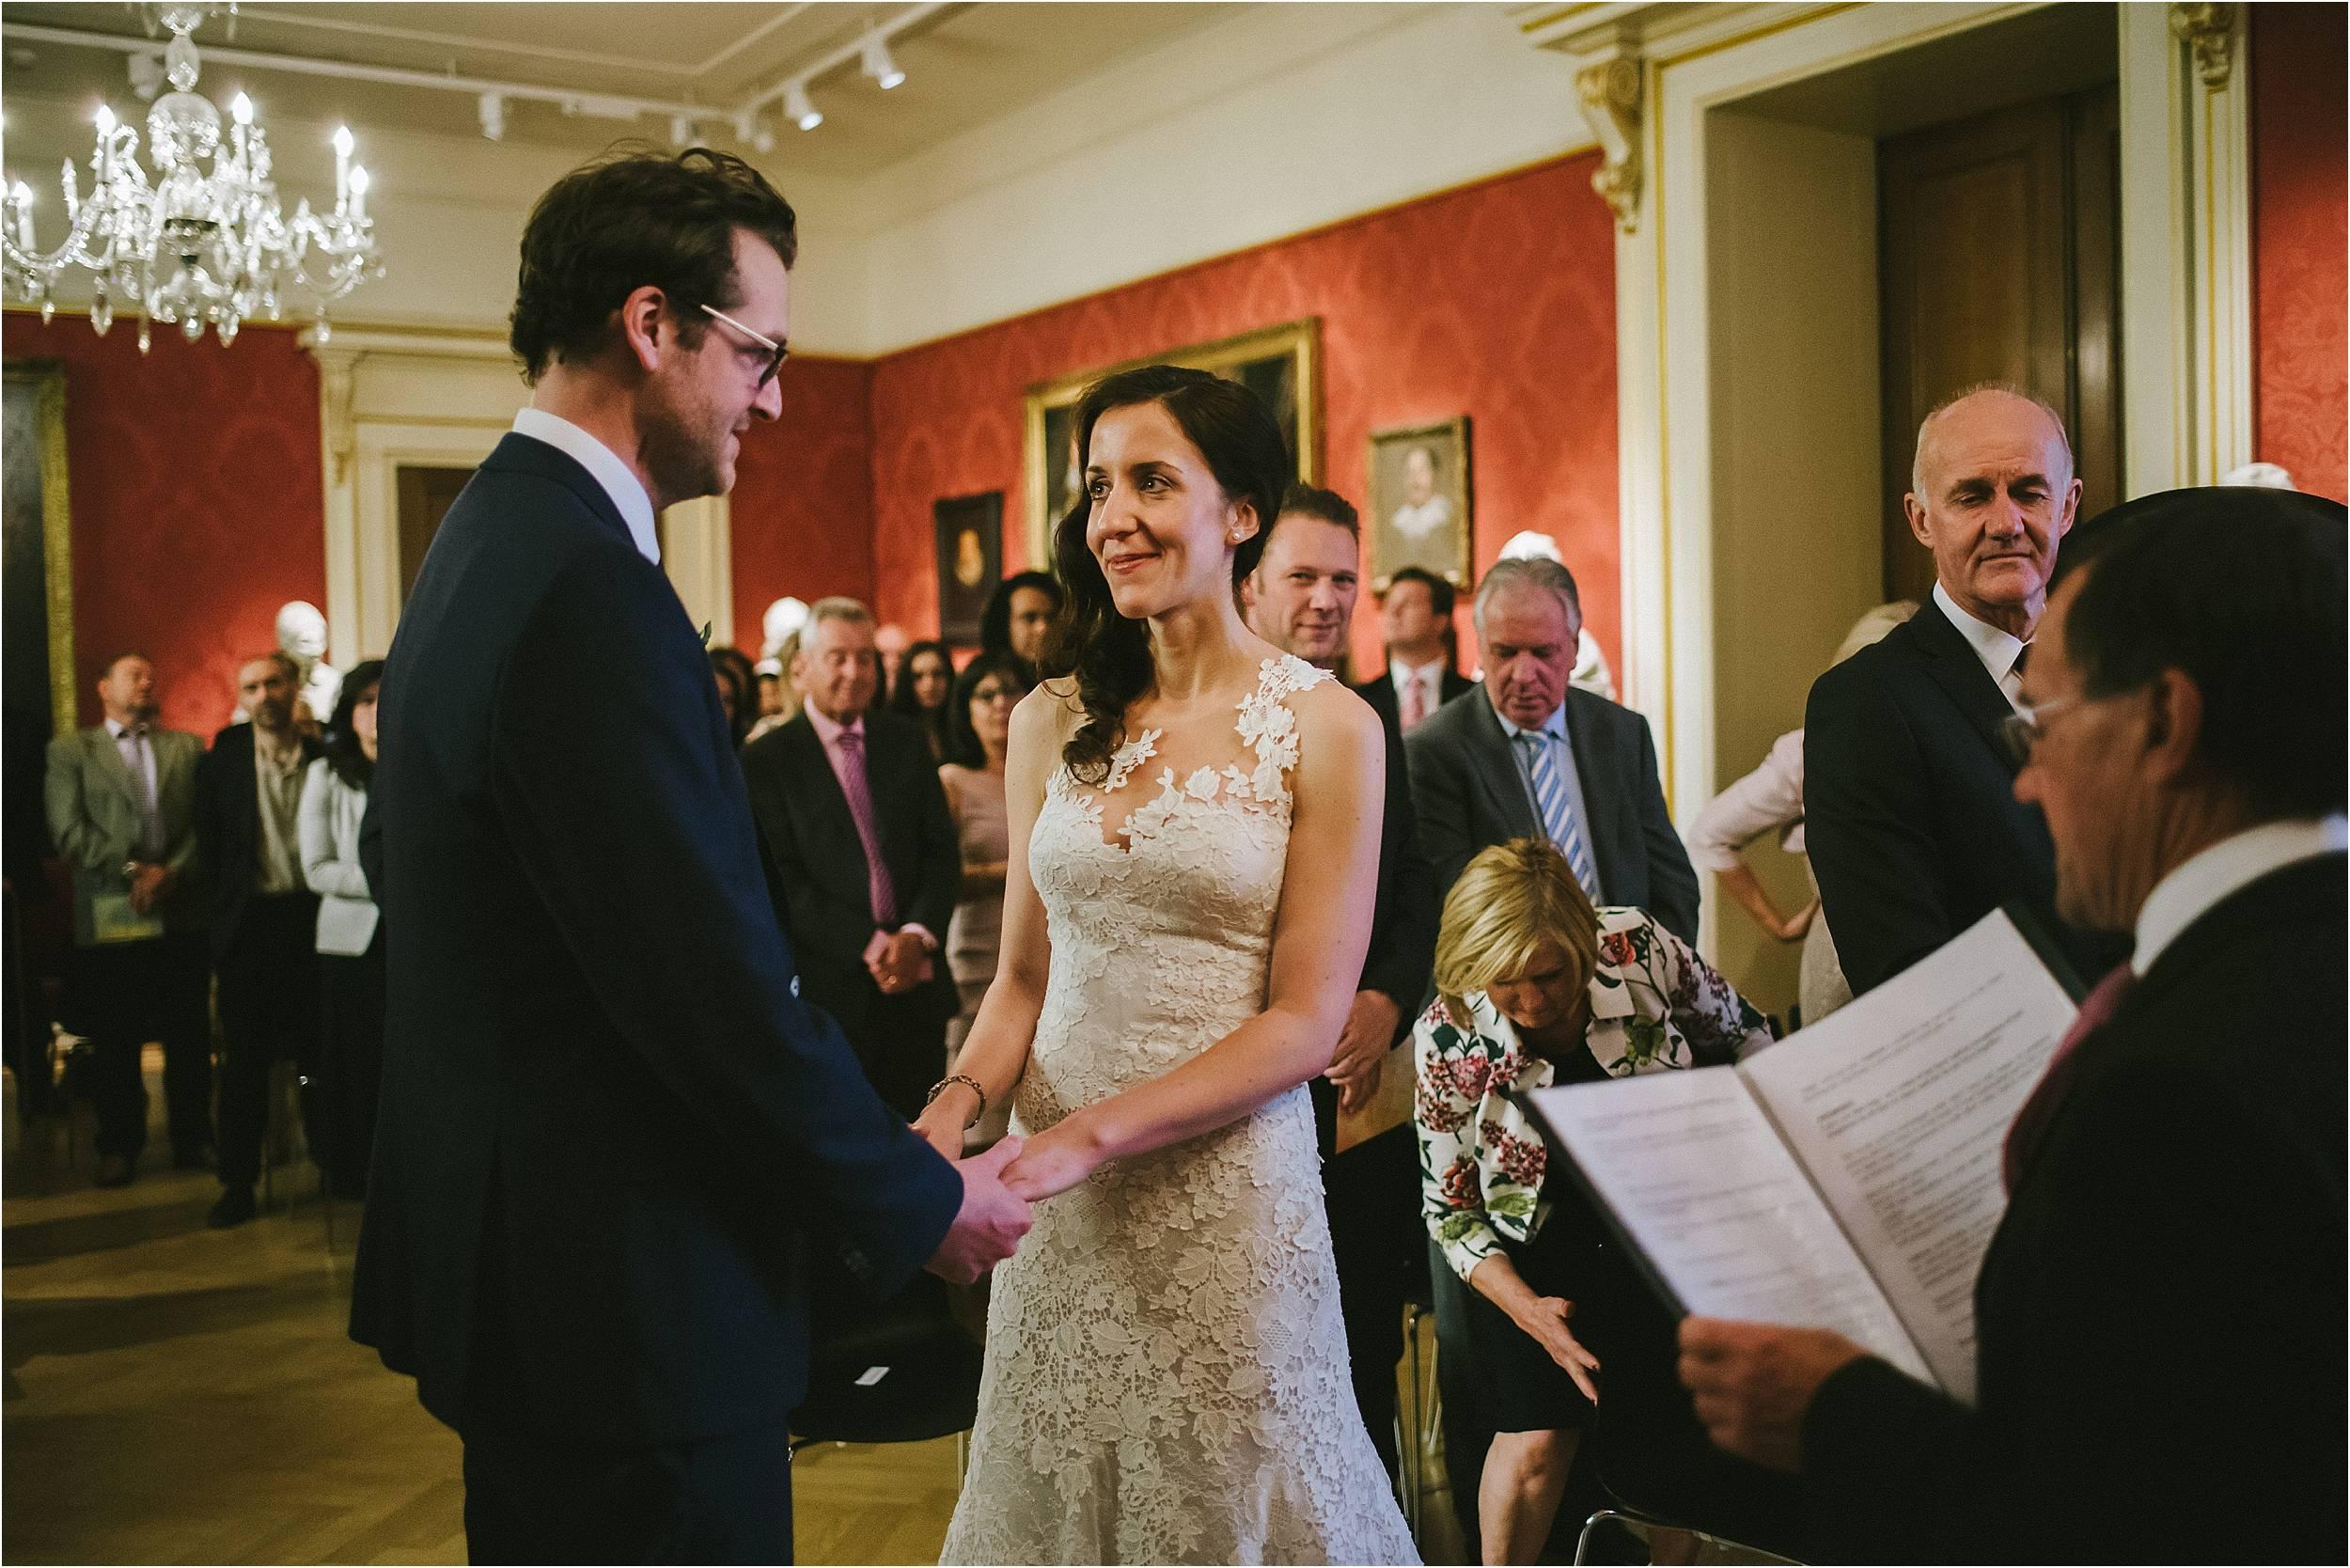 Oxford Ashmolean Museum Wedding Photography_0089.jpg